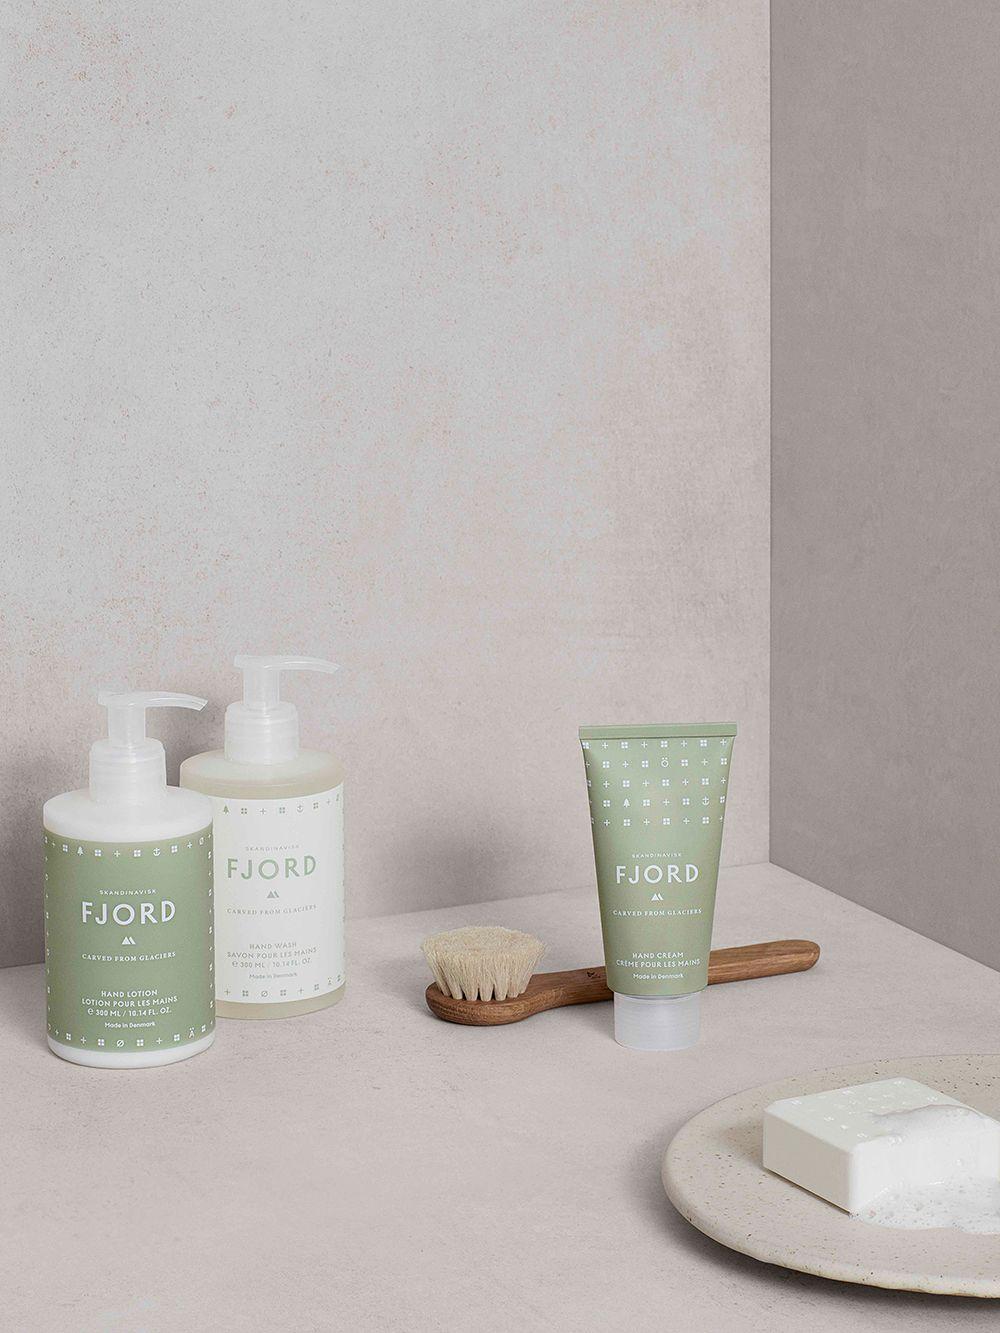 Skandinavisk's Fjord hand wash and hand cream.